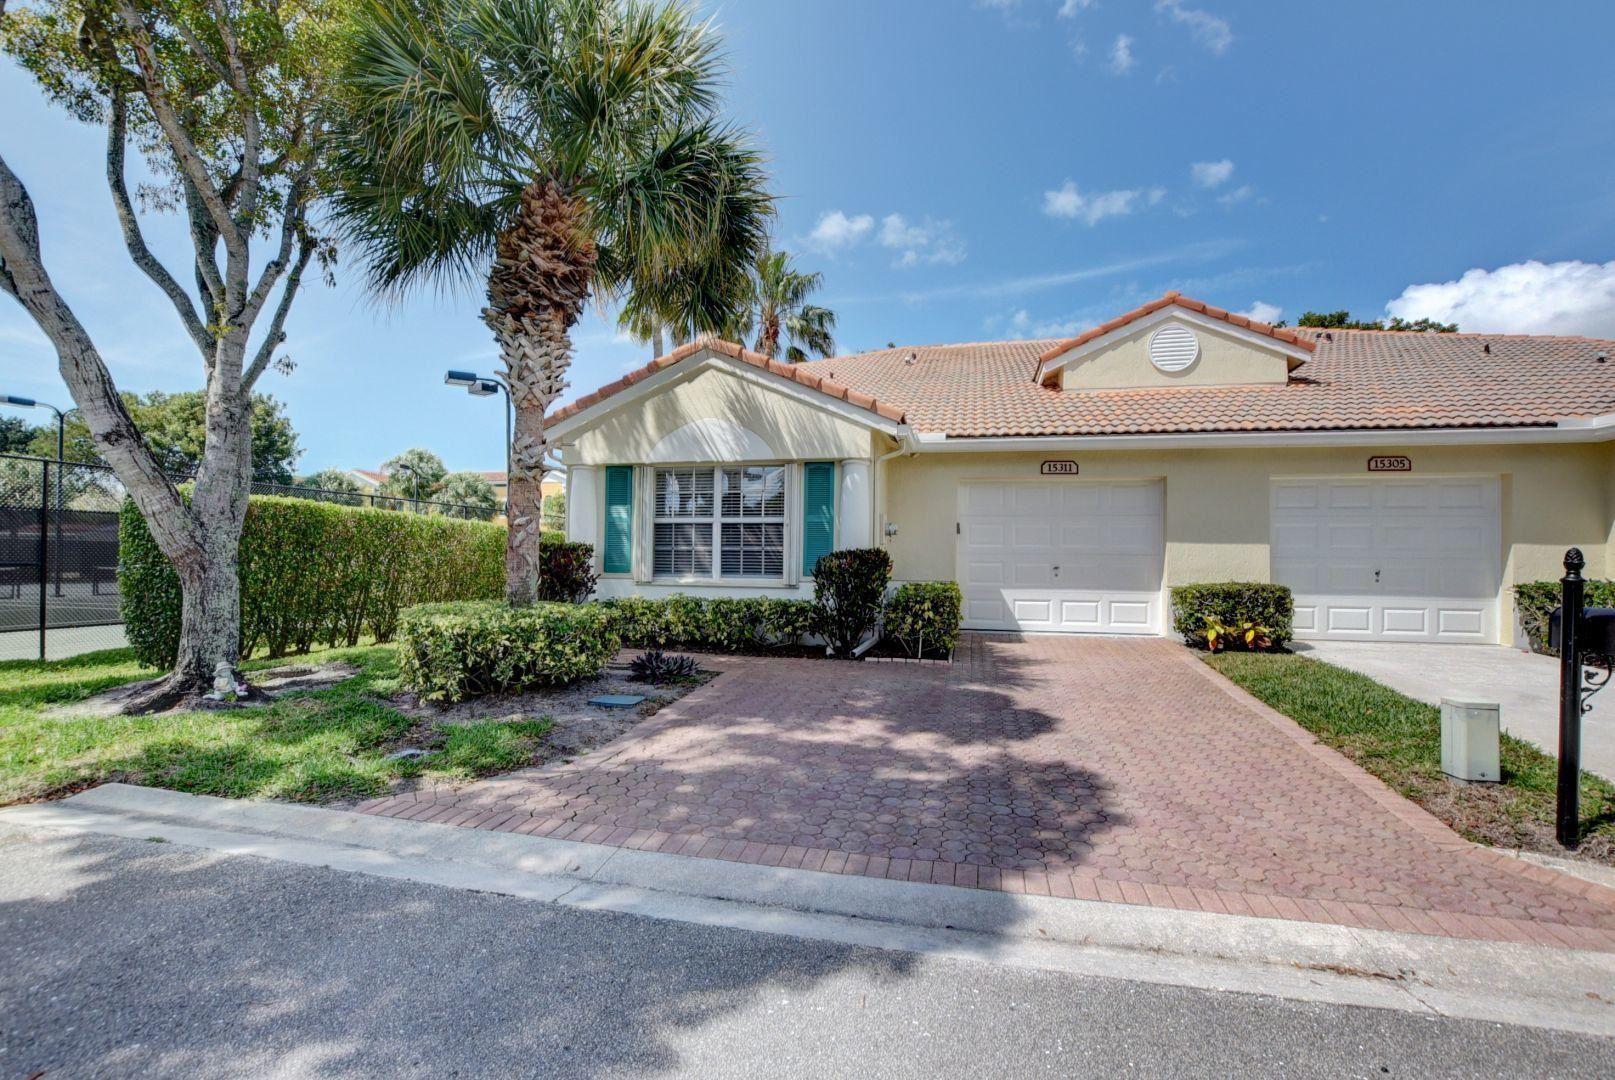 15311 Ixora Road, Delray Beach, FL 33484 - MLS#: RX-10610141